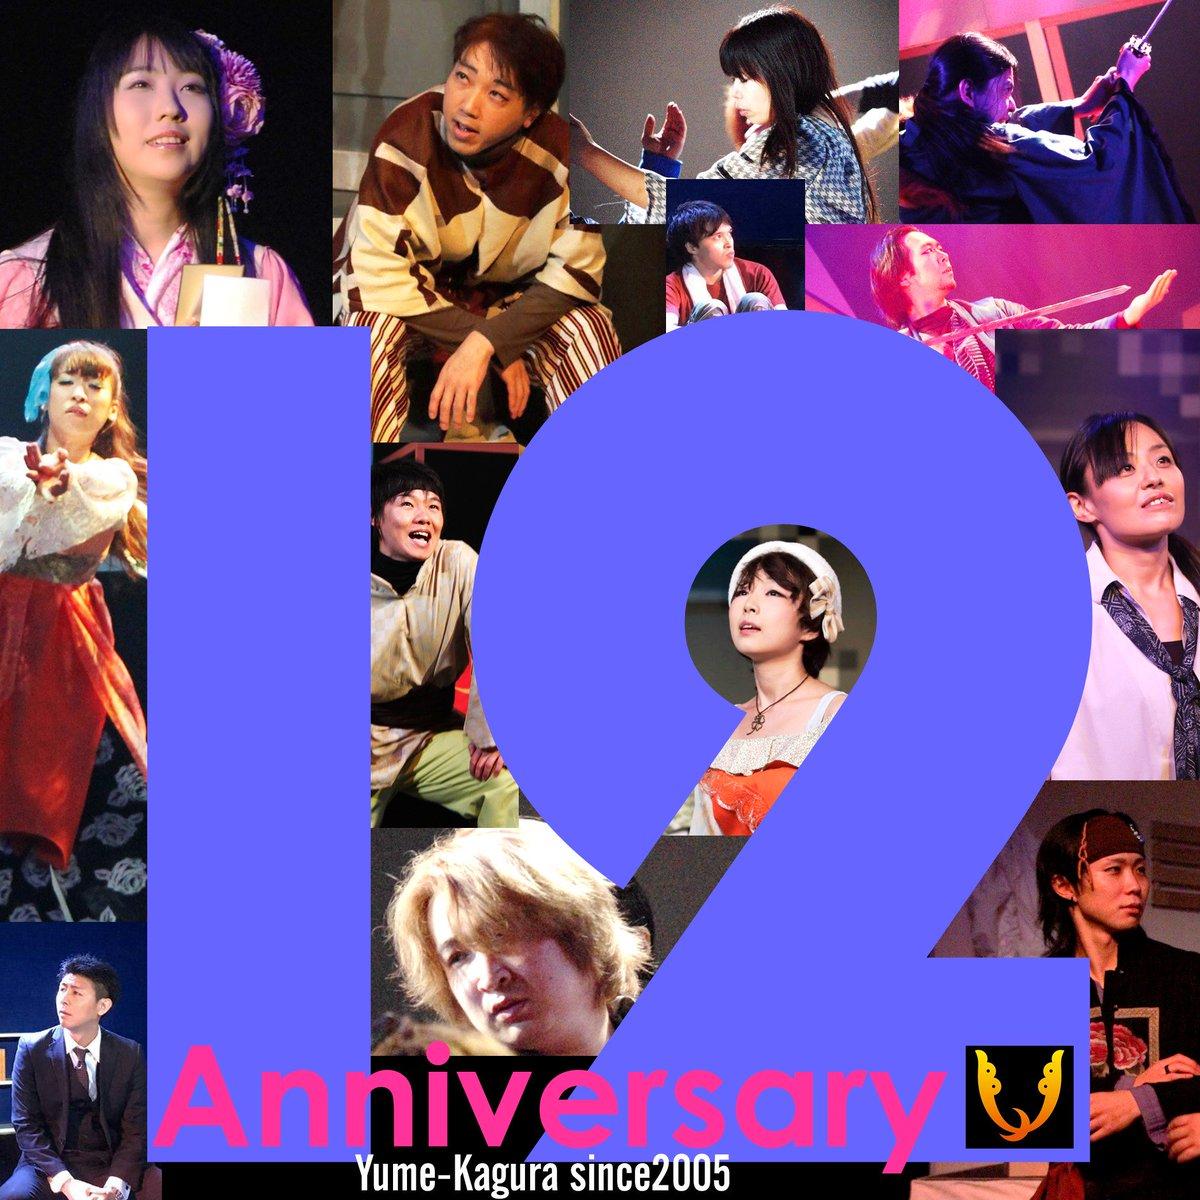 ★★Happy Birthday★★本日夢神楽の誕生日!12歳です。支えていただいている全ての皆様に心から感謝を。13人